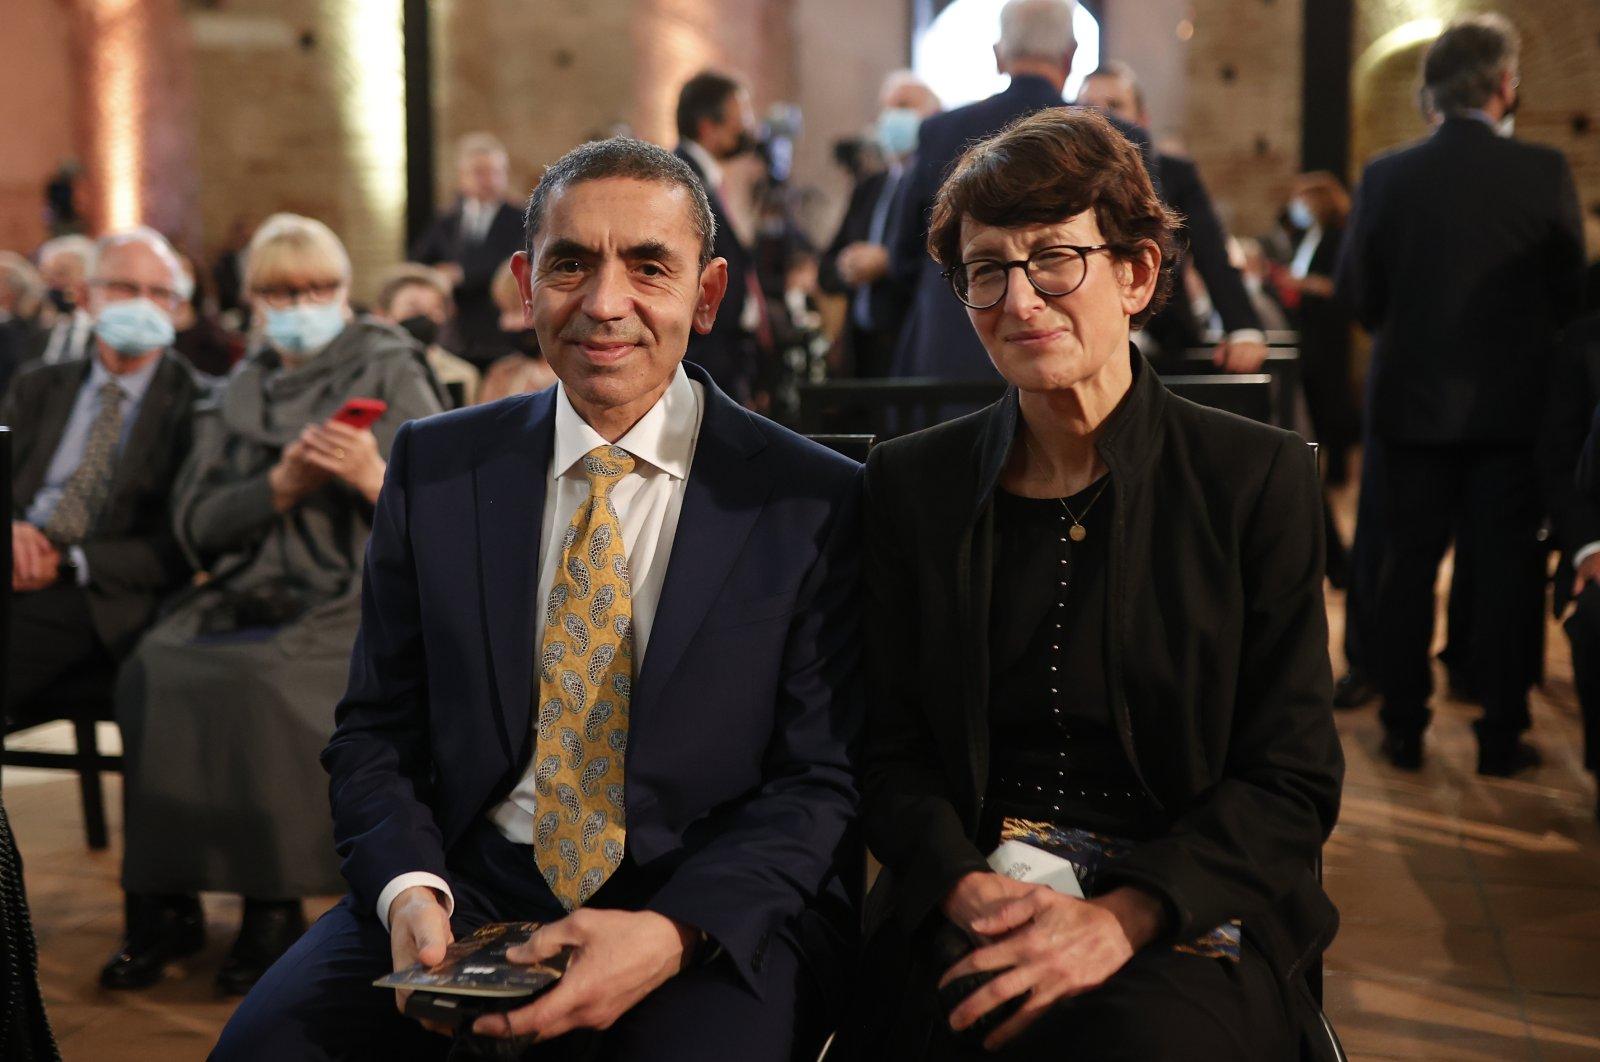 Turkish-German scientists Uğur Şahin and Özlem Türeci attend the award ceremony in Athens, Greece on Oct. 13, 2021. (AA Photo)